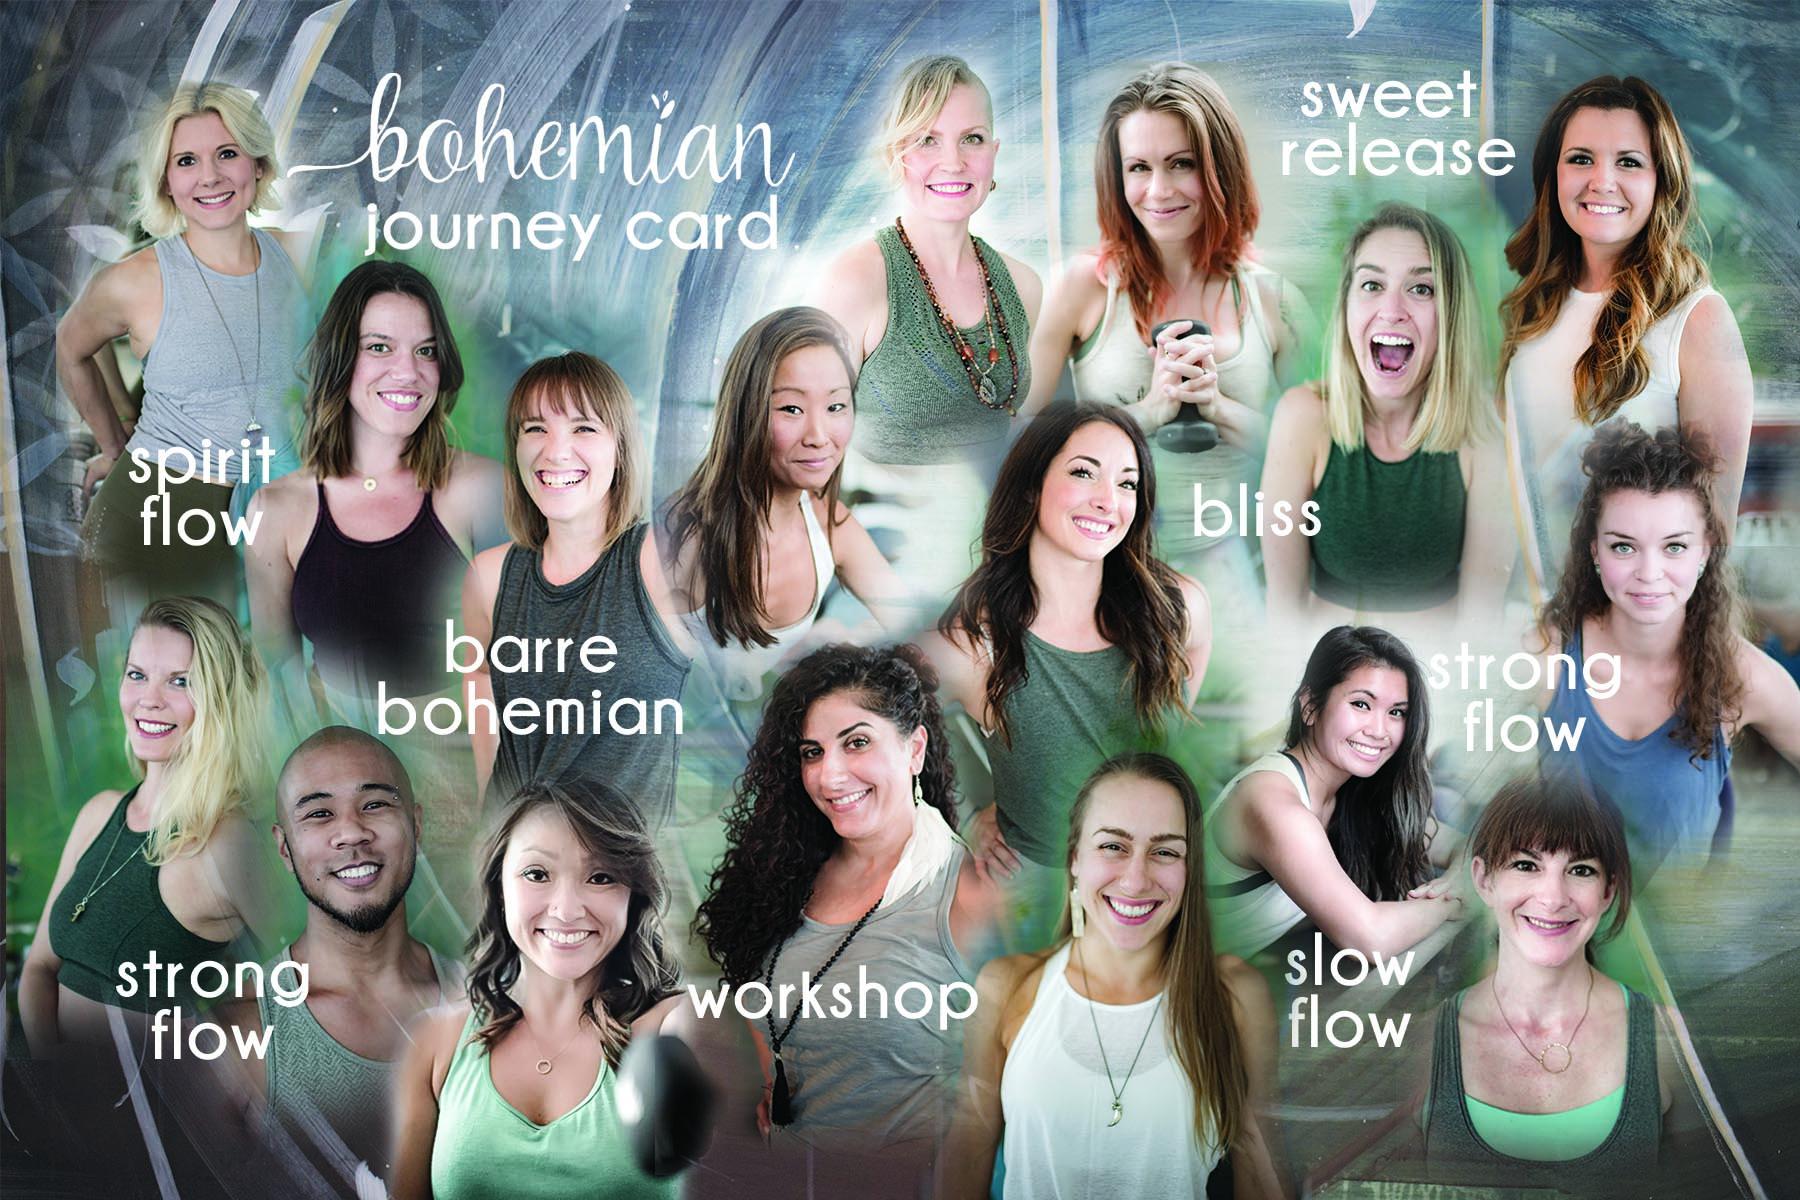 The Journey Card Bohemian Studios Best Yoga and Barre Studio Seattle Phinney Ridge West Seattle